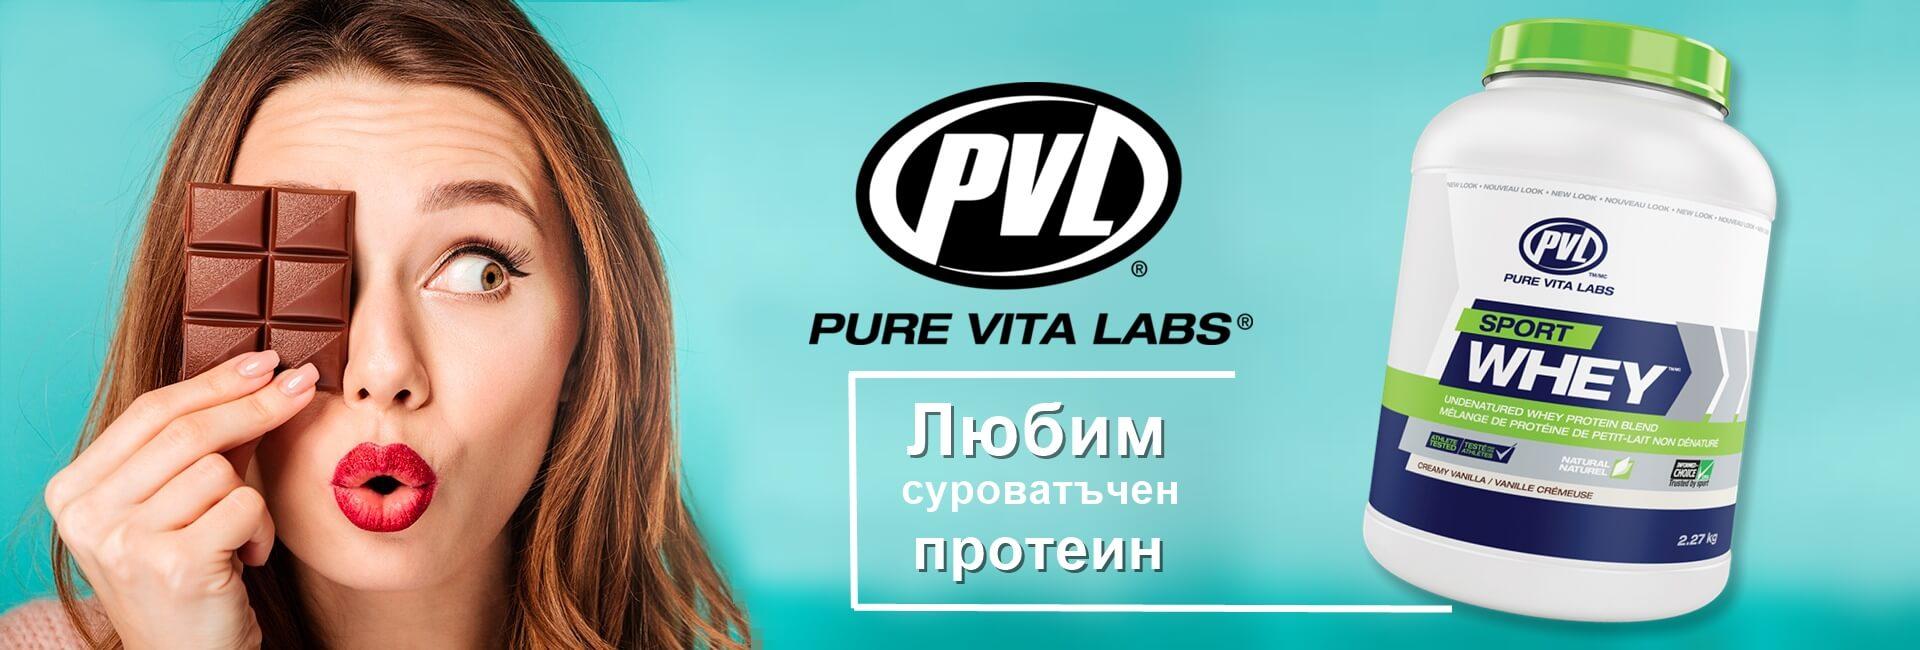 pvl whey